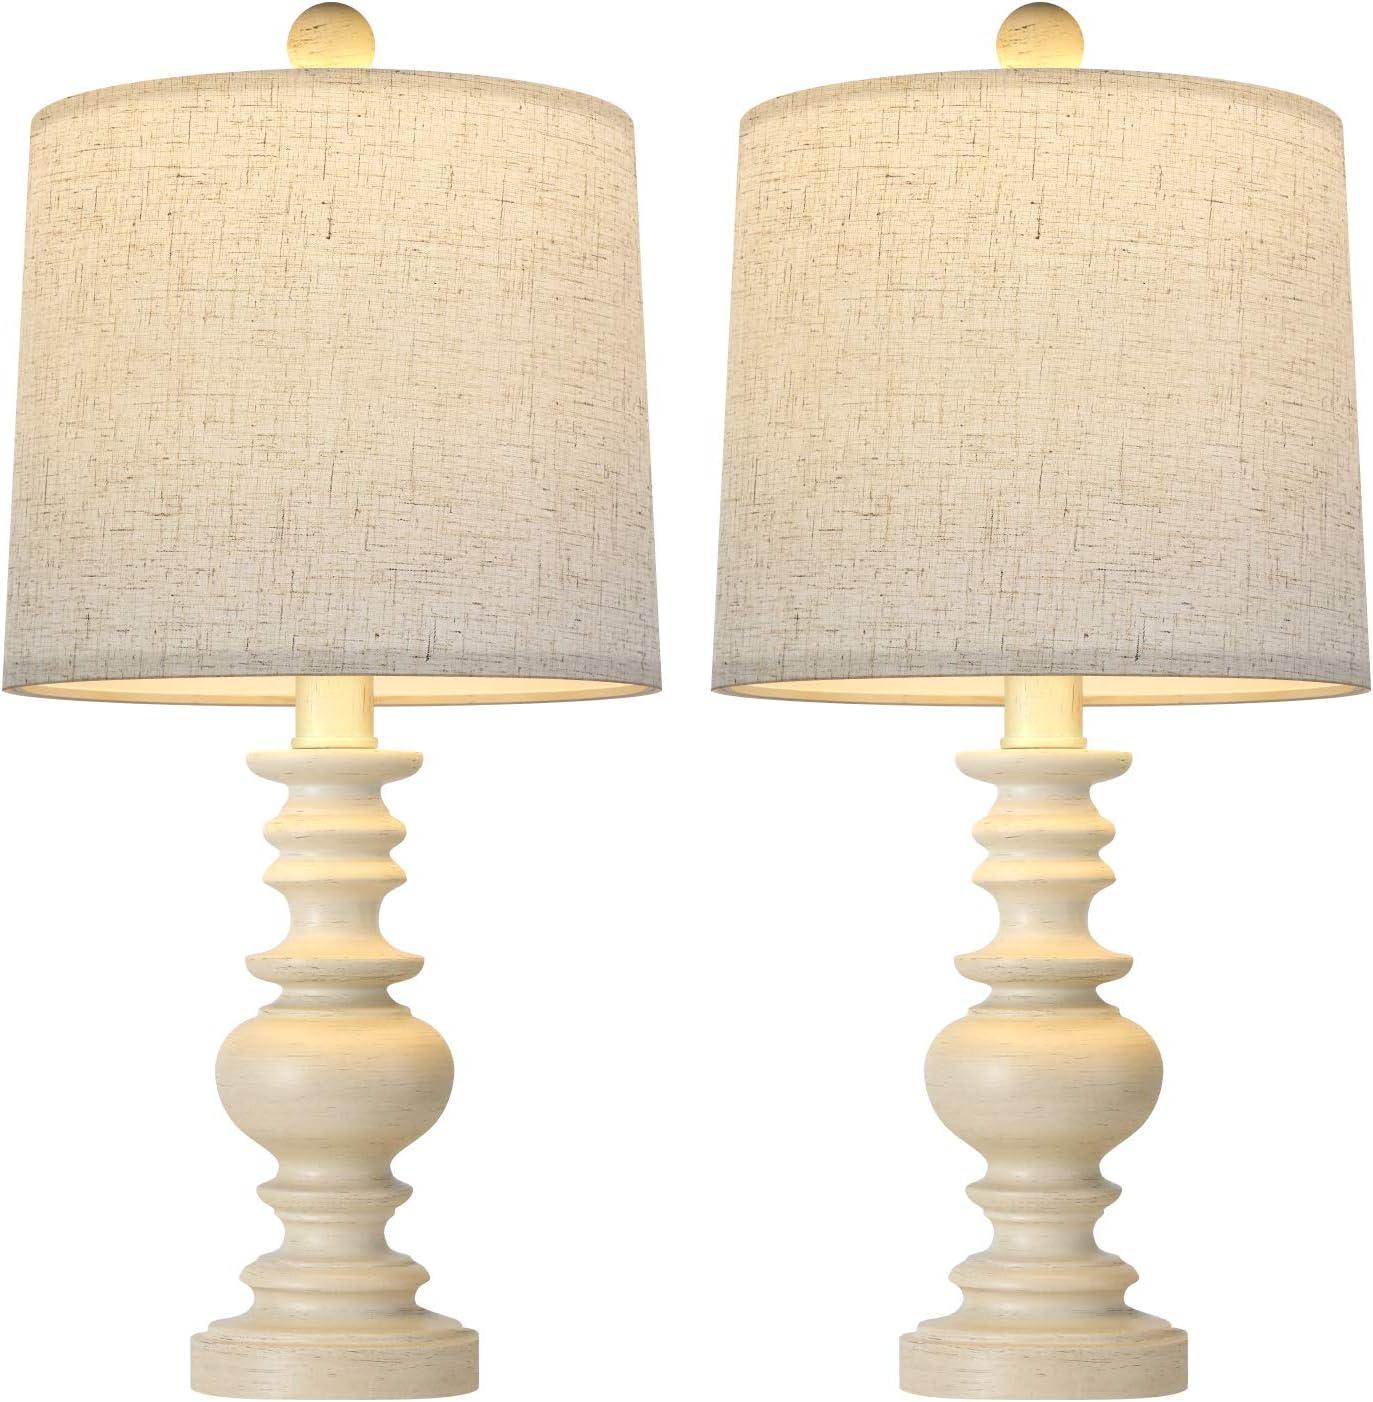 BOBOMOMO Tradition 20.5'' Rustic Table Lamp Set of 2 for Living Room Farmhouse Bedside Desk Lamps Bedroom Nightstand Vintage Lamps Linen Washed